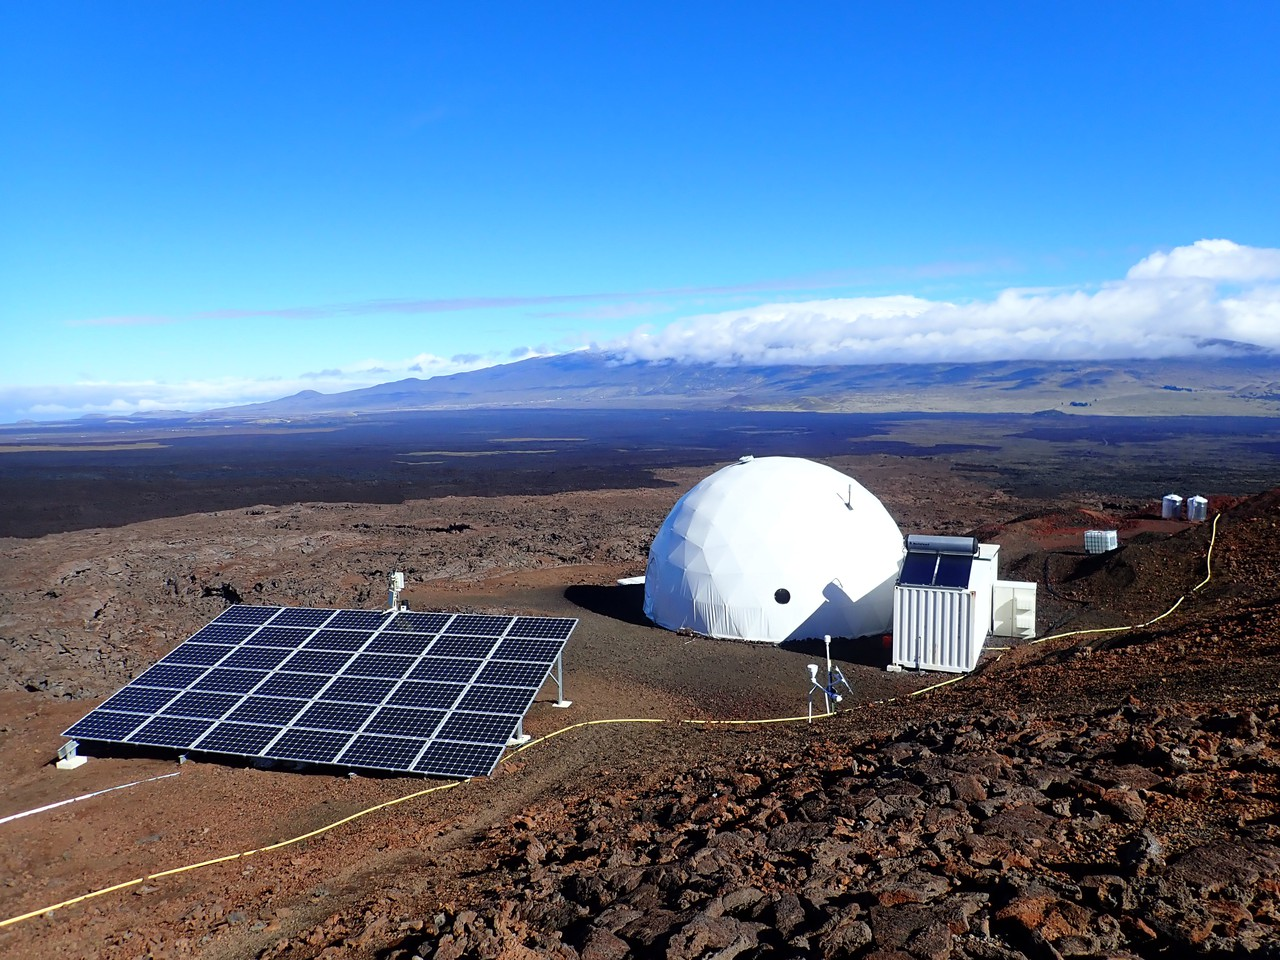 Crewmembers spend days to months in the HI-SEAS Mars/moon habitat atop Mauna Loa. (Credit: HI-SEAS)